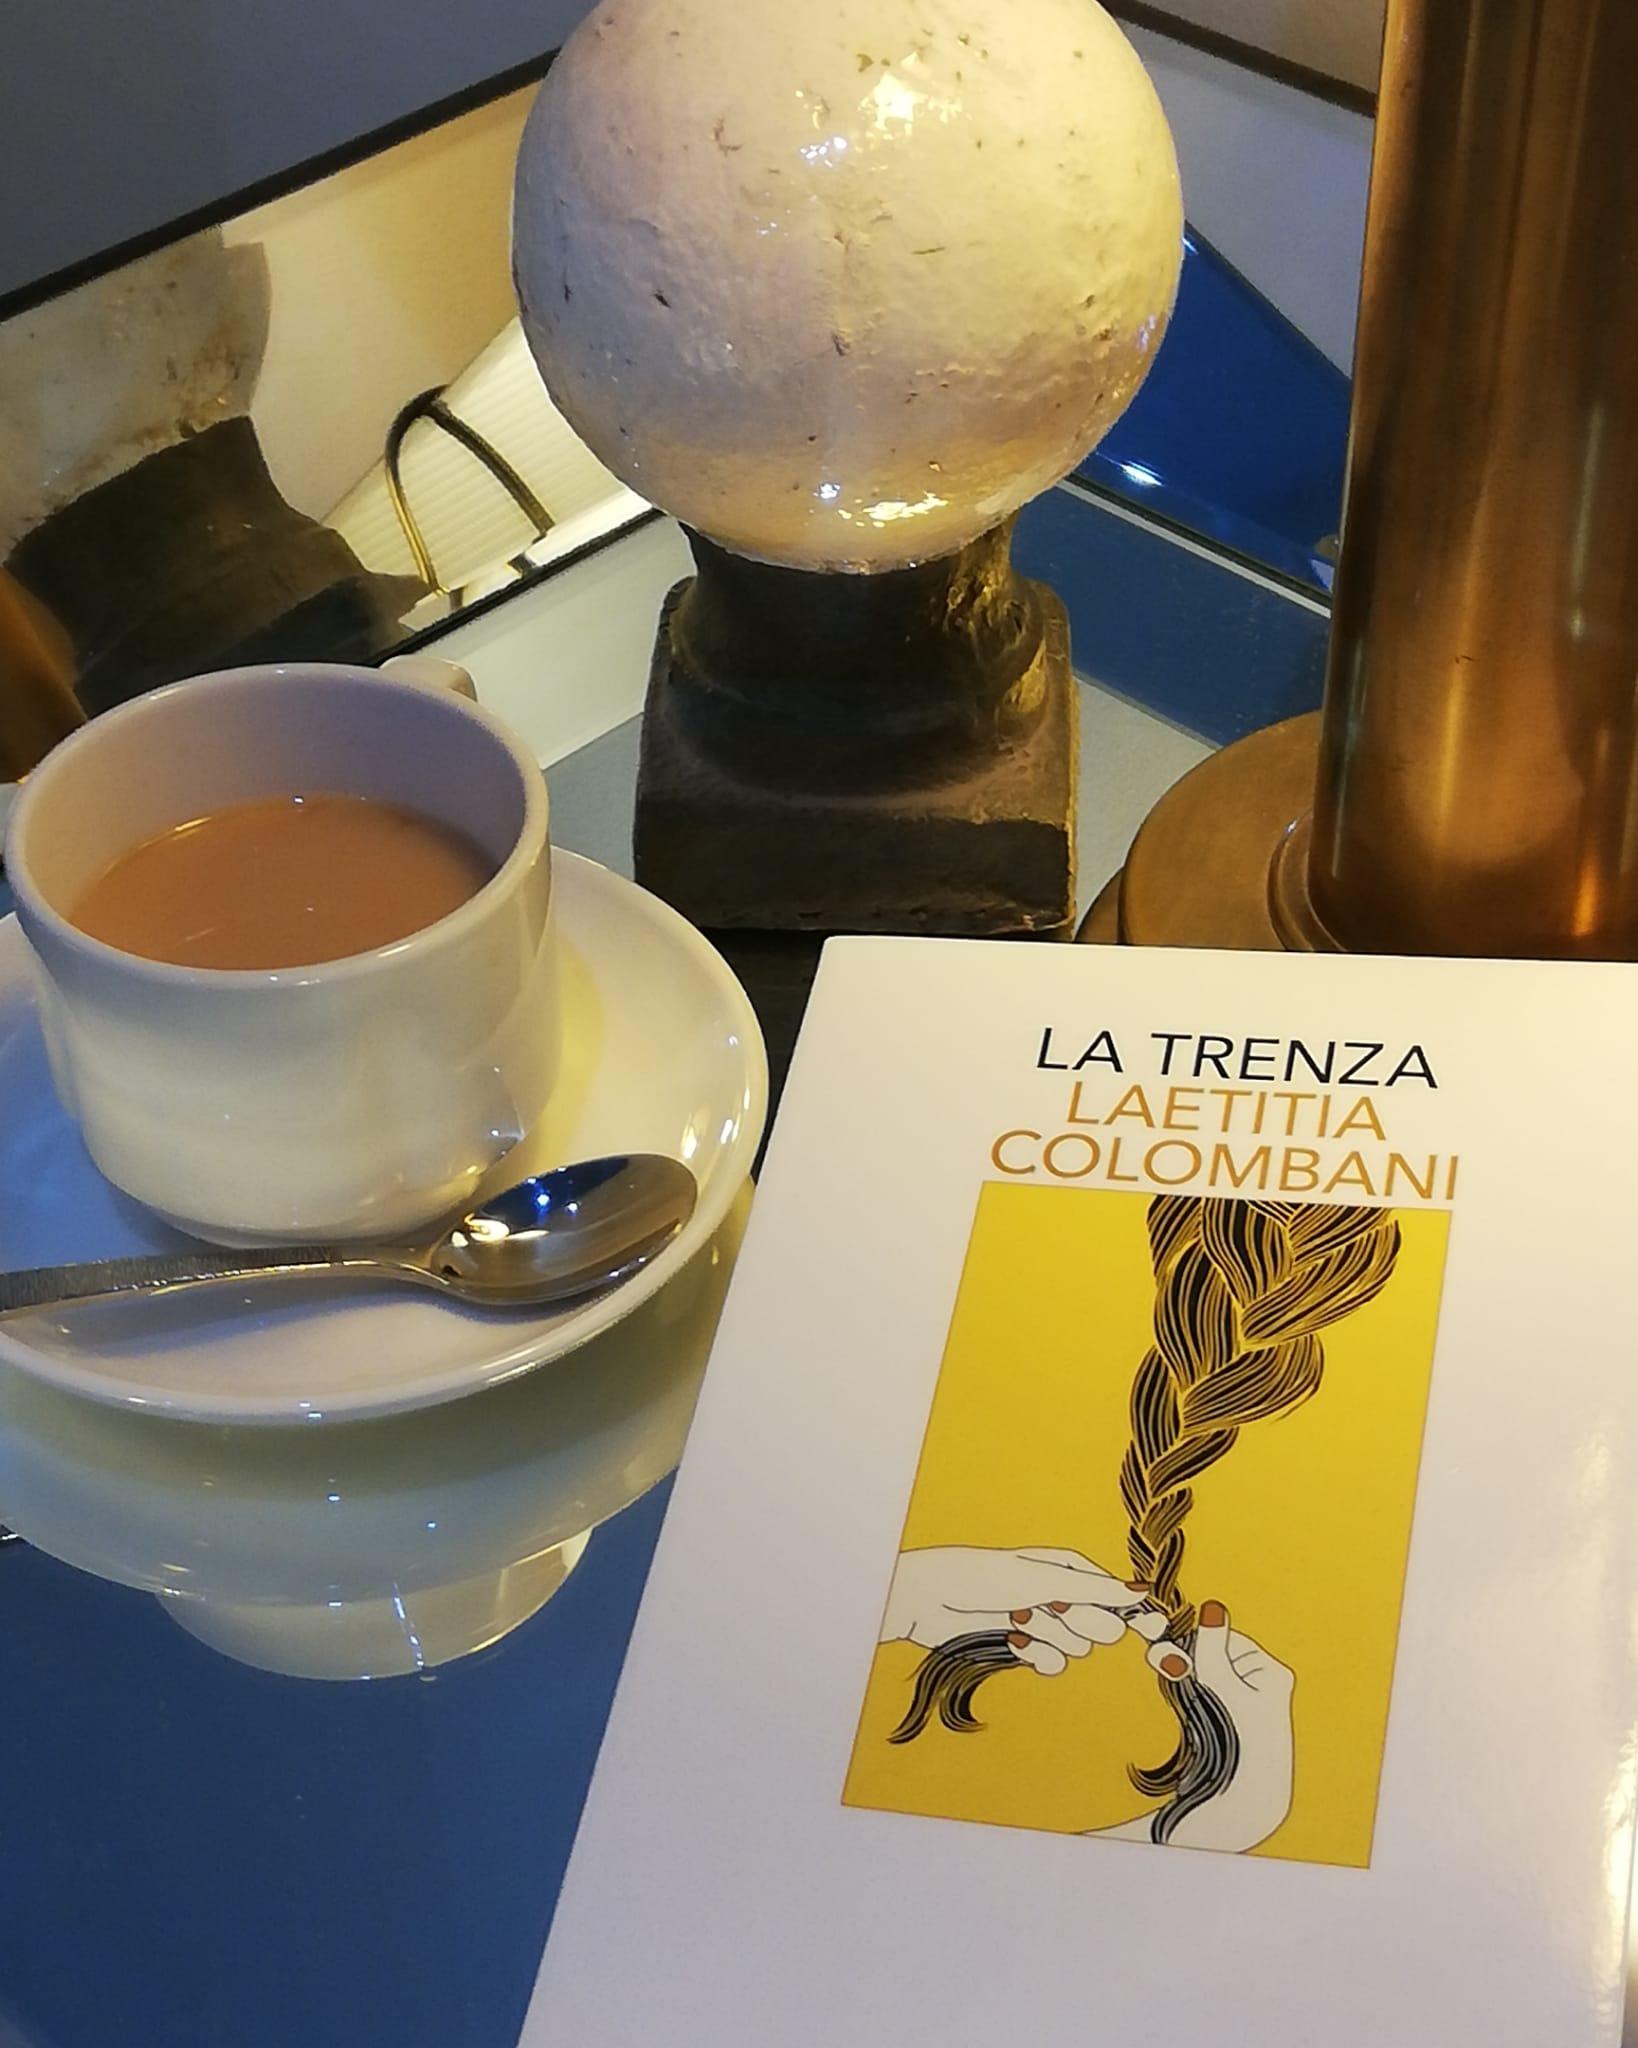 winter-of-67-la-trenza-laetitia-colombani.jpeg